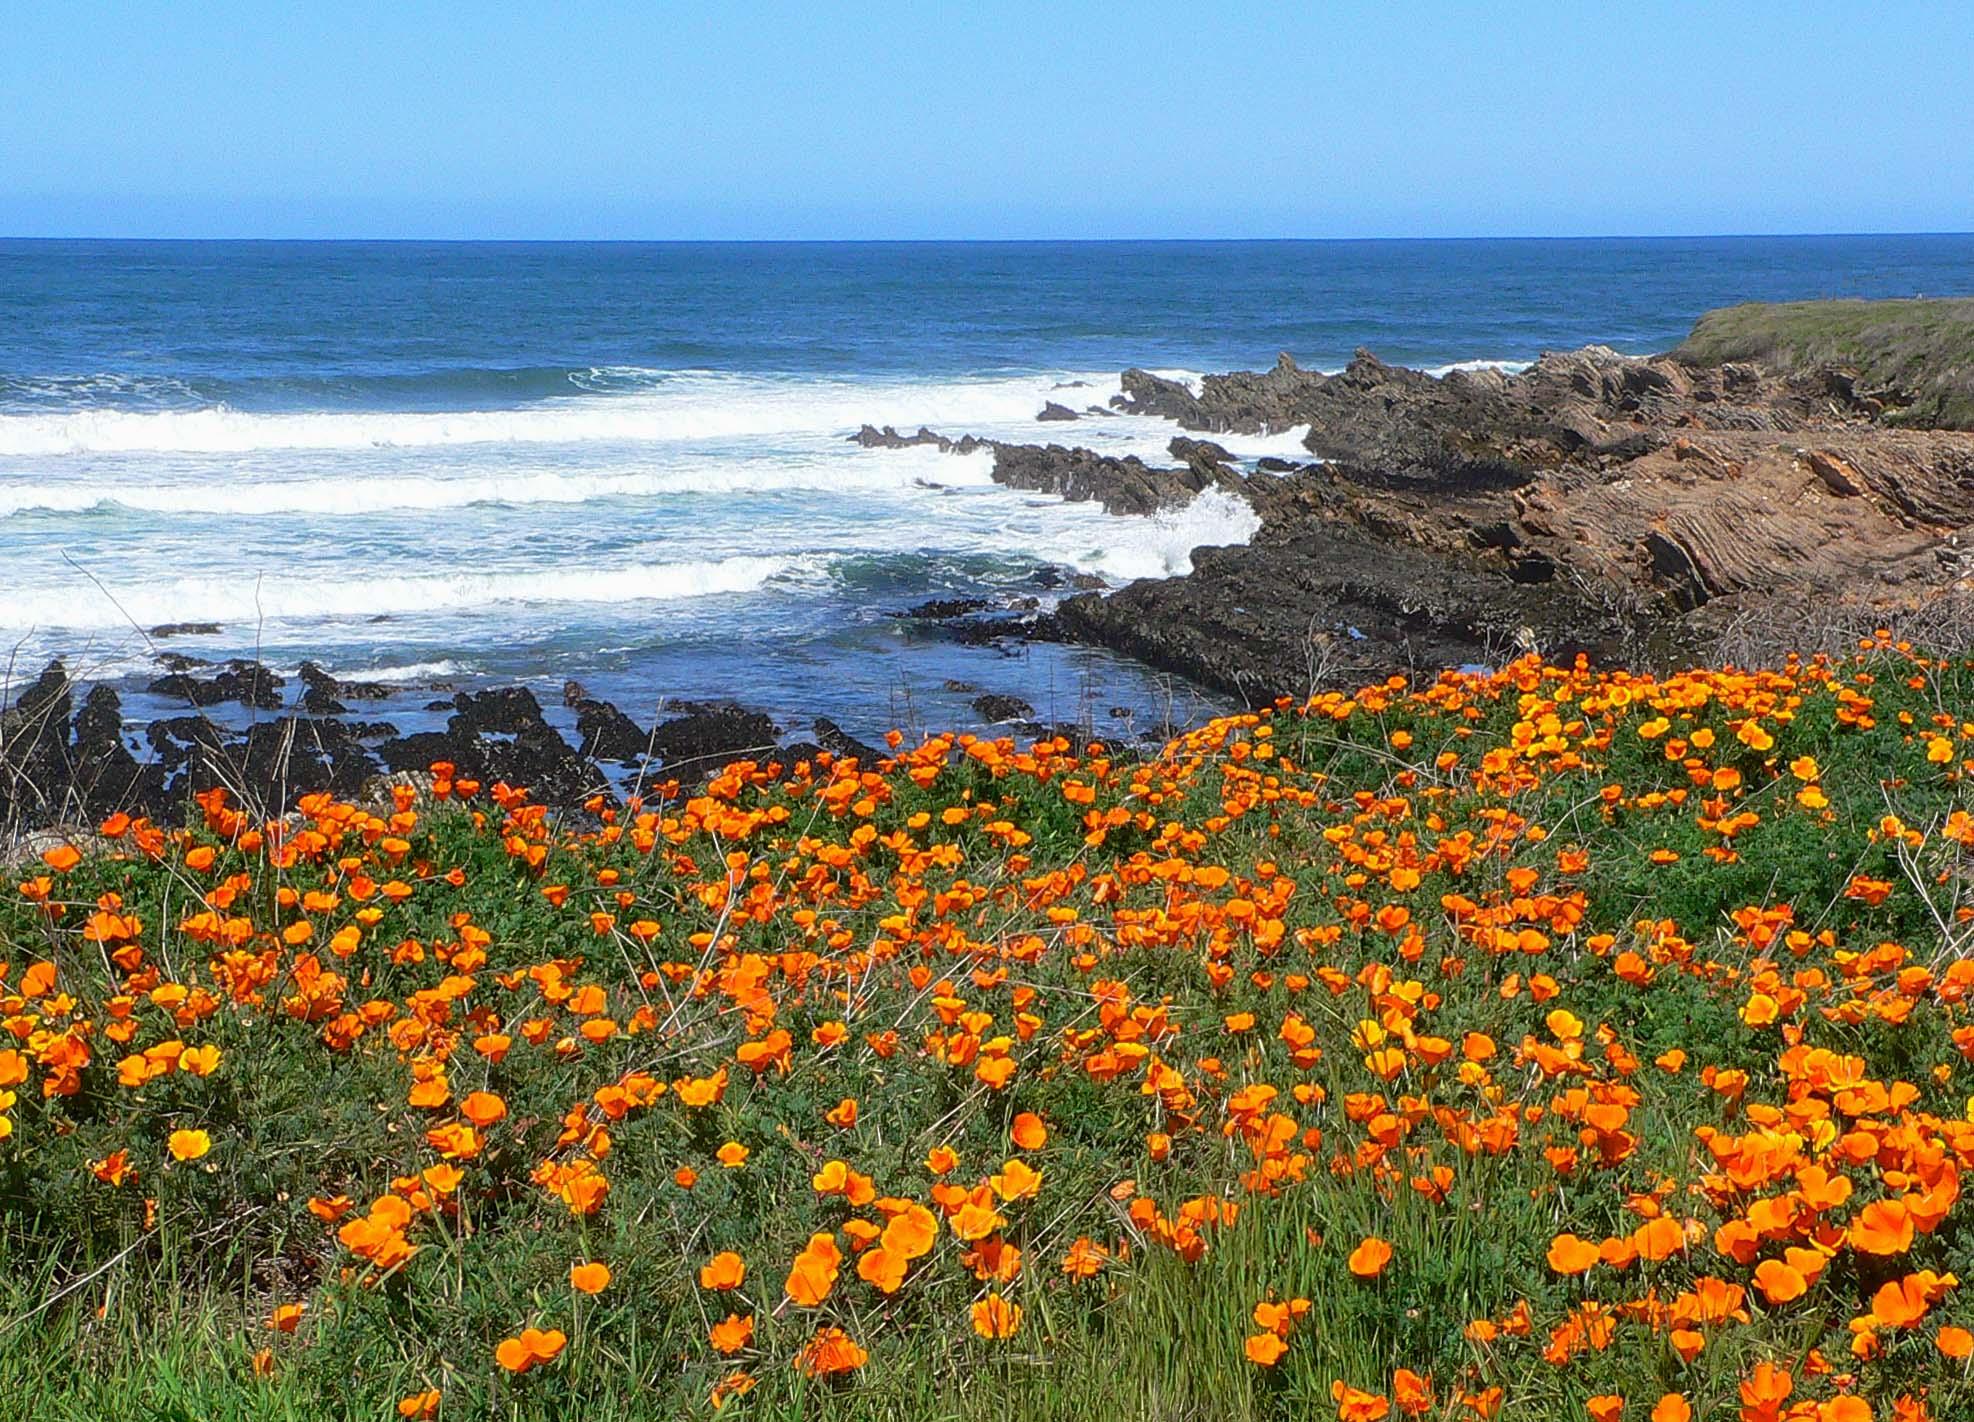 California poppies, California